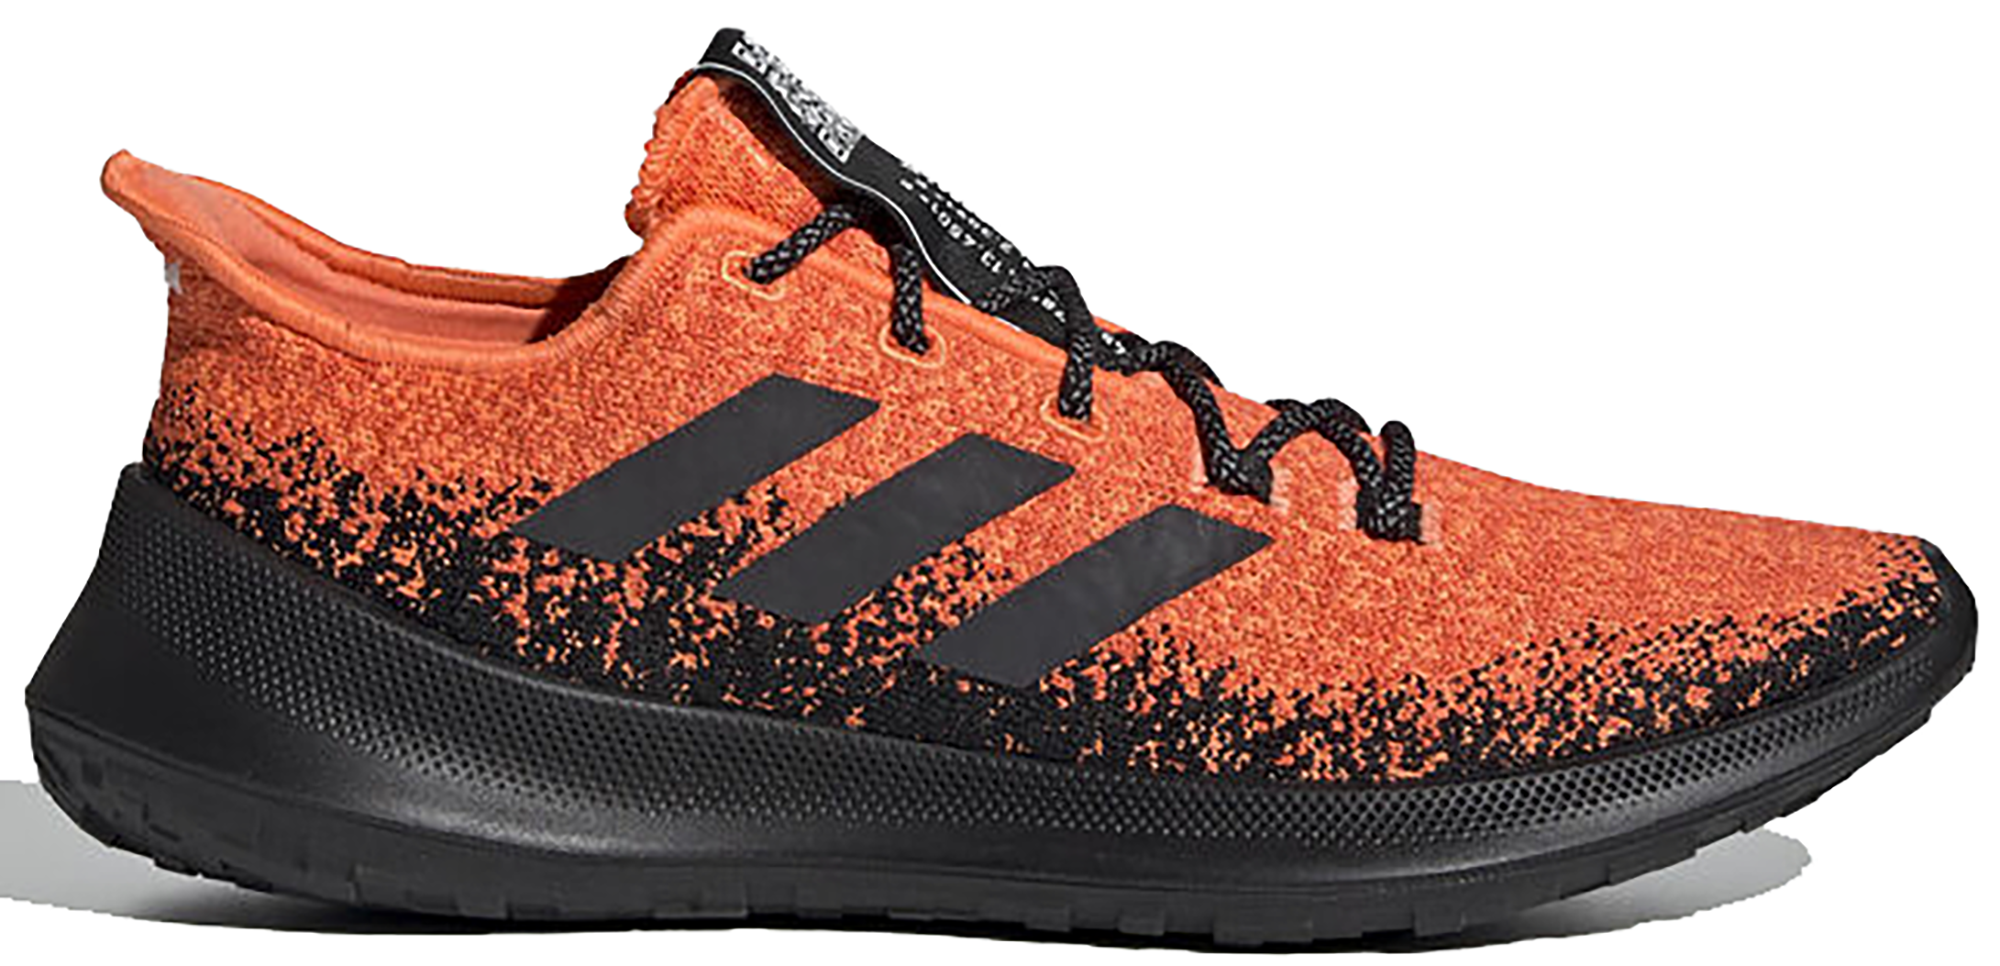 adidas Sensebounce+ Active Orange - G27233